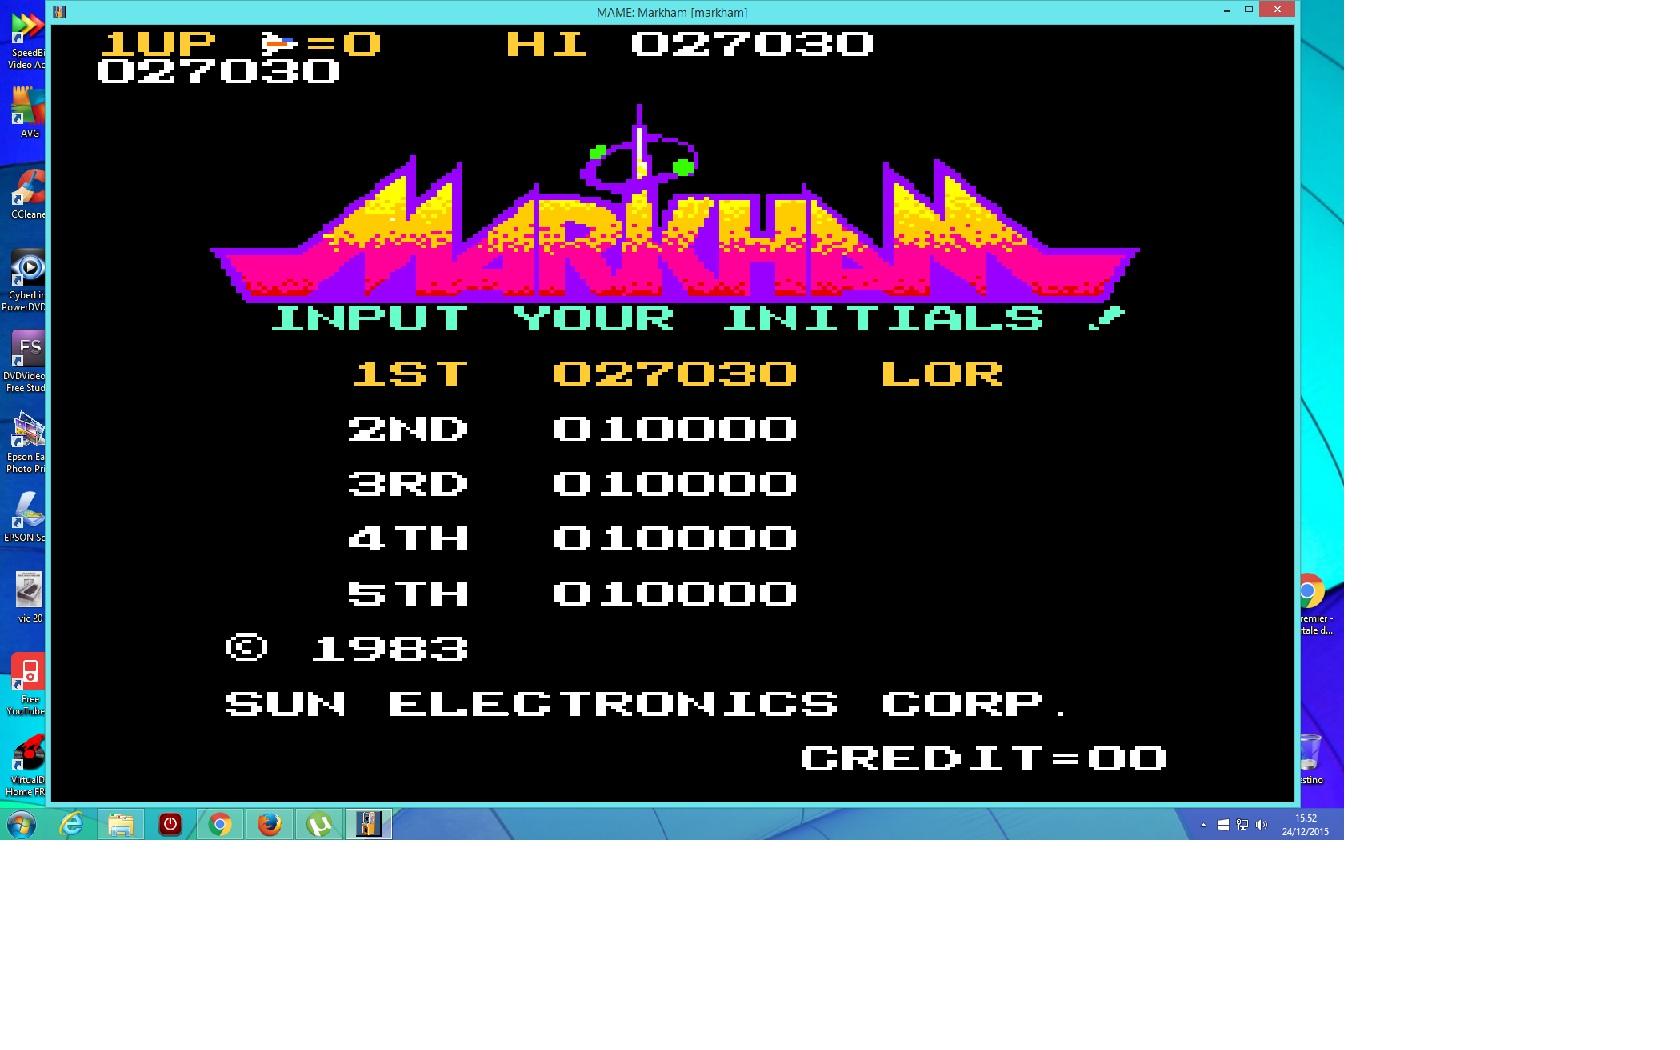 lenny2571: Markham [markham] (Arcade Emulated / M.A.M.E.) 27,030 points on 2015-12-24 08:53:30